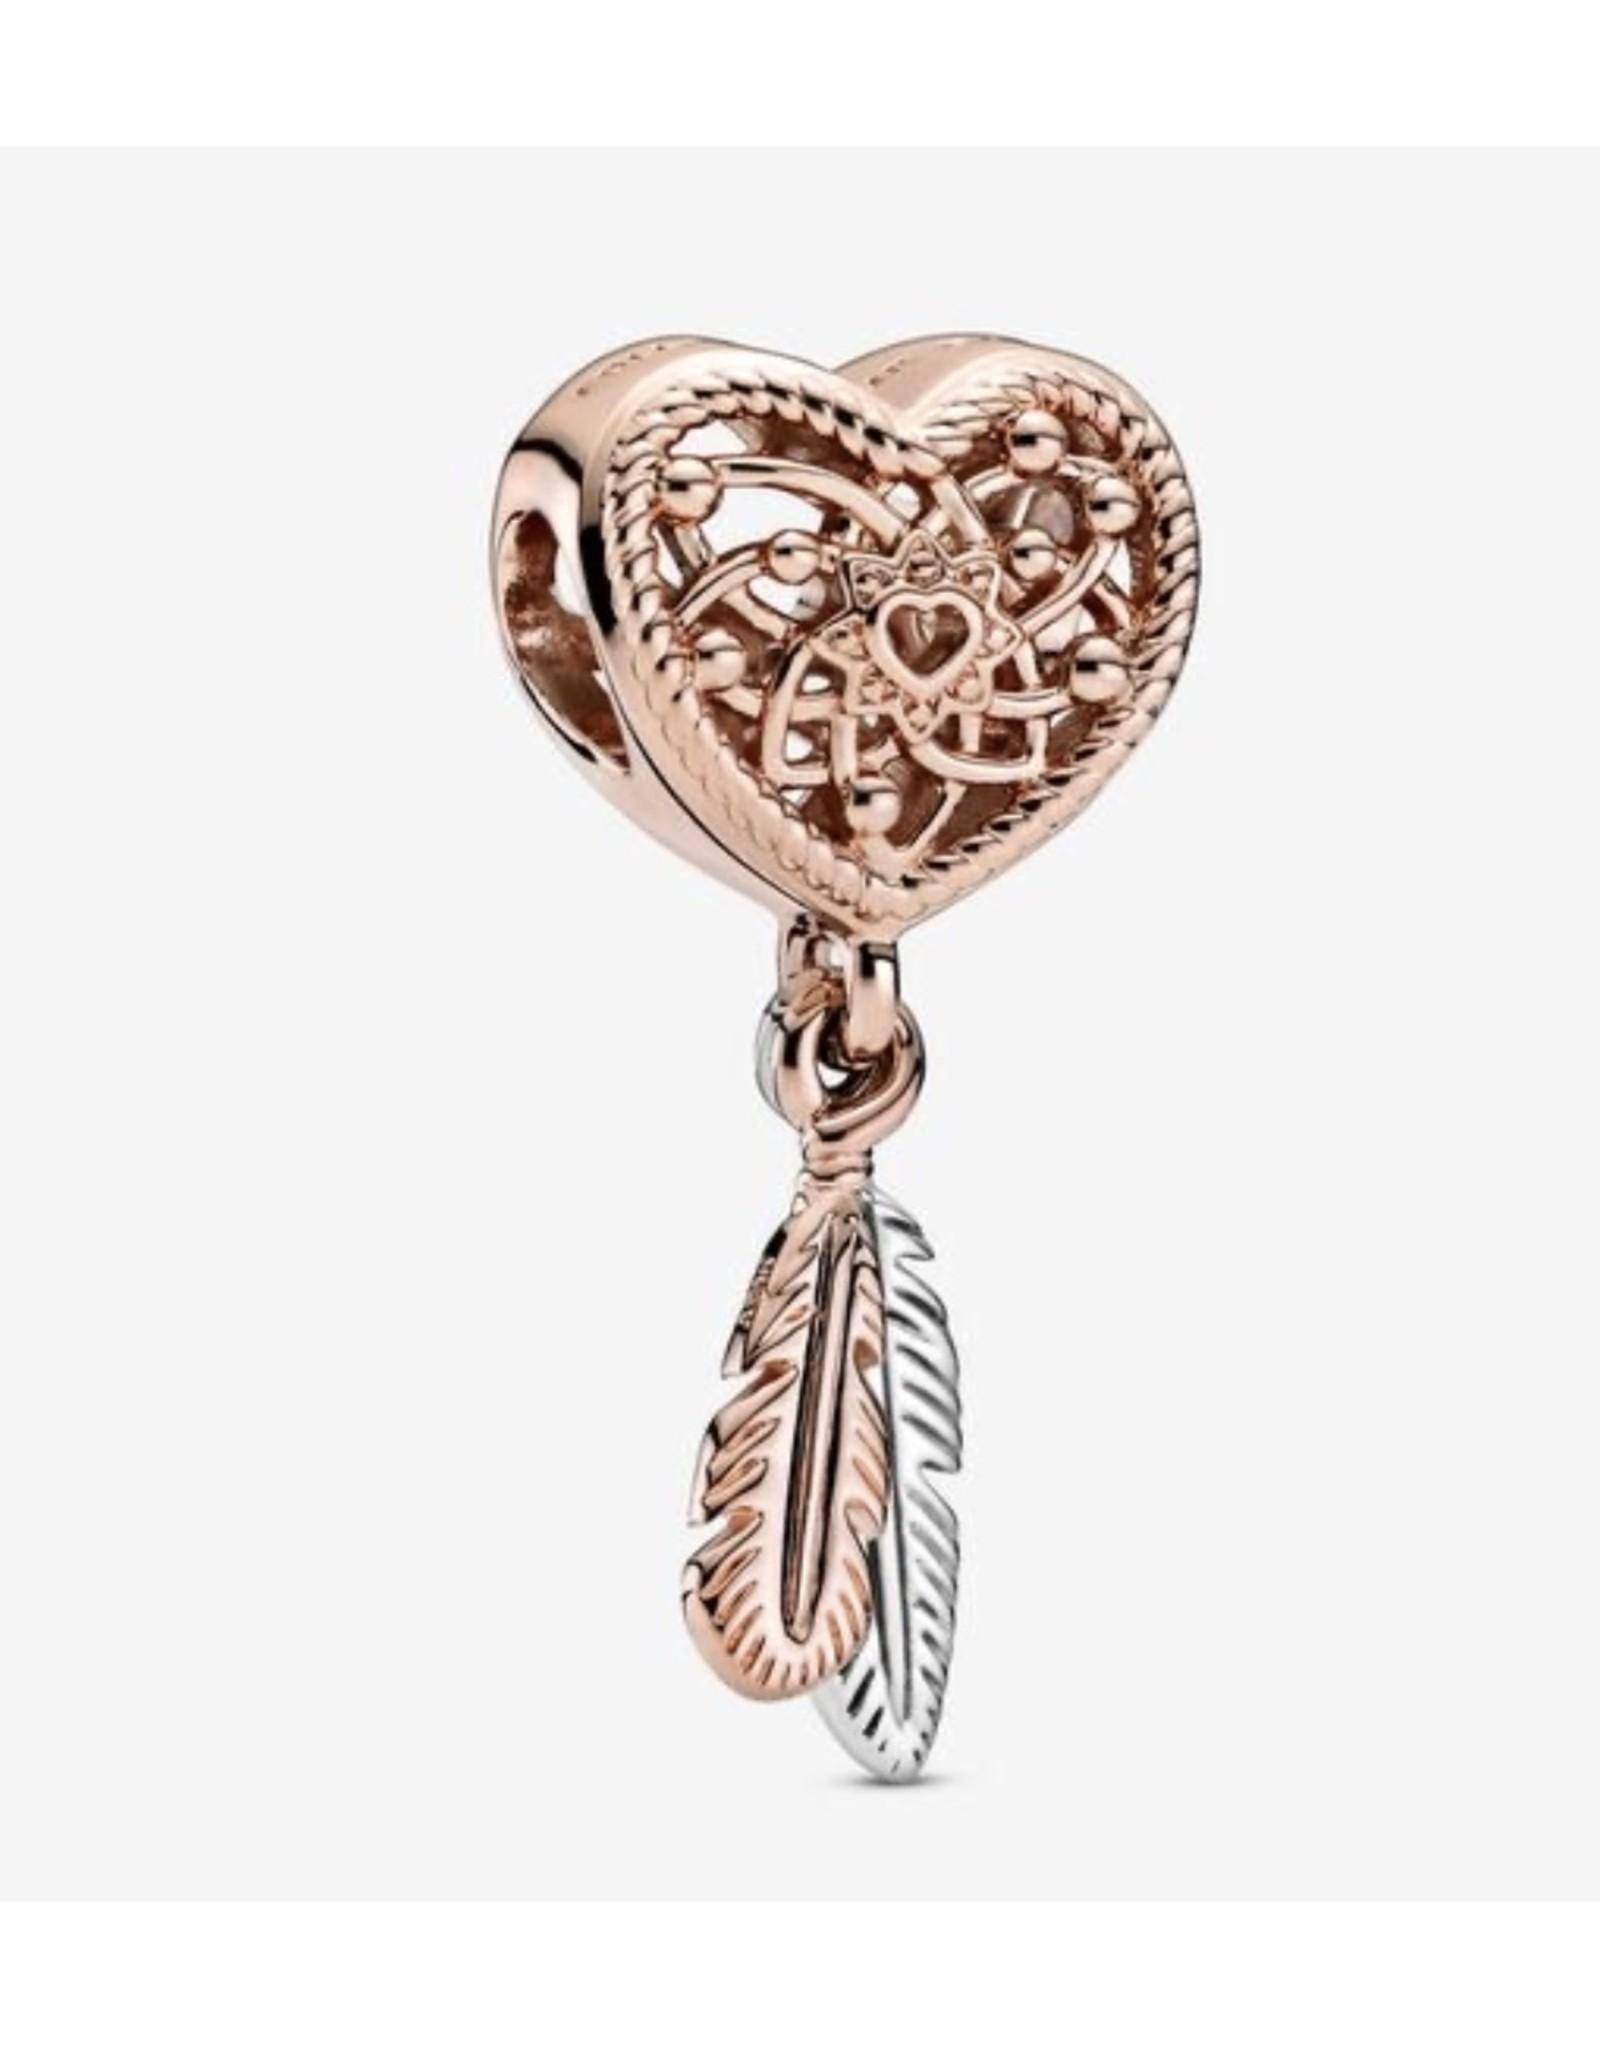 Pandora Pandora Charm,789068C00, Openwork Heart&Two Feathers Dreamcatcher, Rose Gold